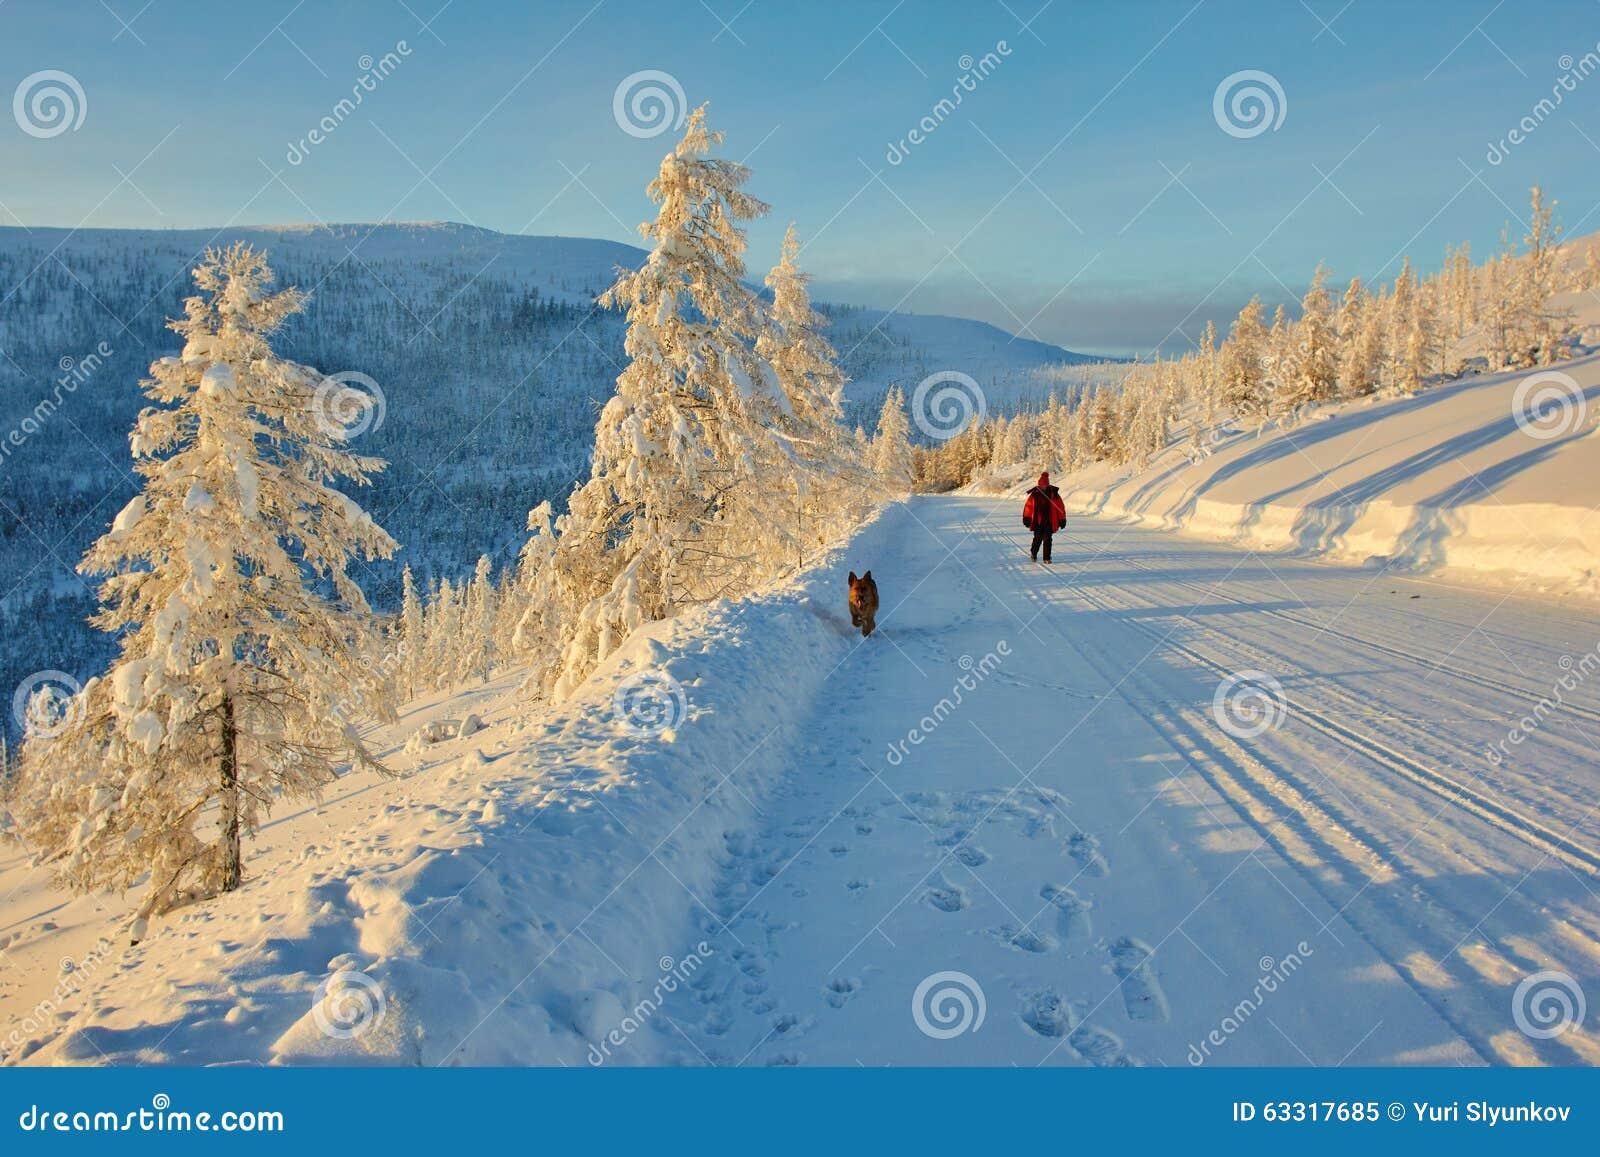 Decline on pass. Winter. Evening. Kolyma IMG_9570